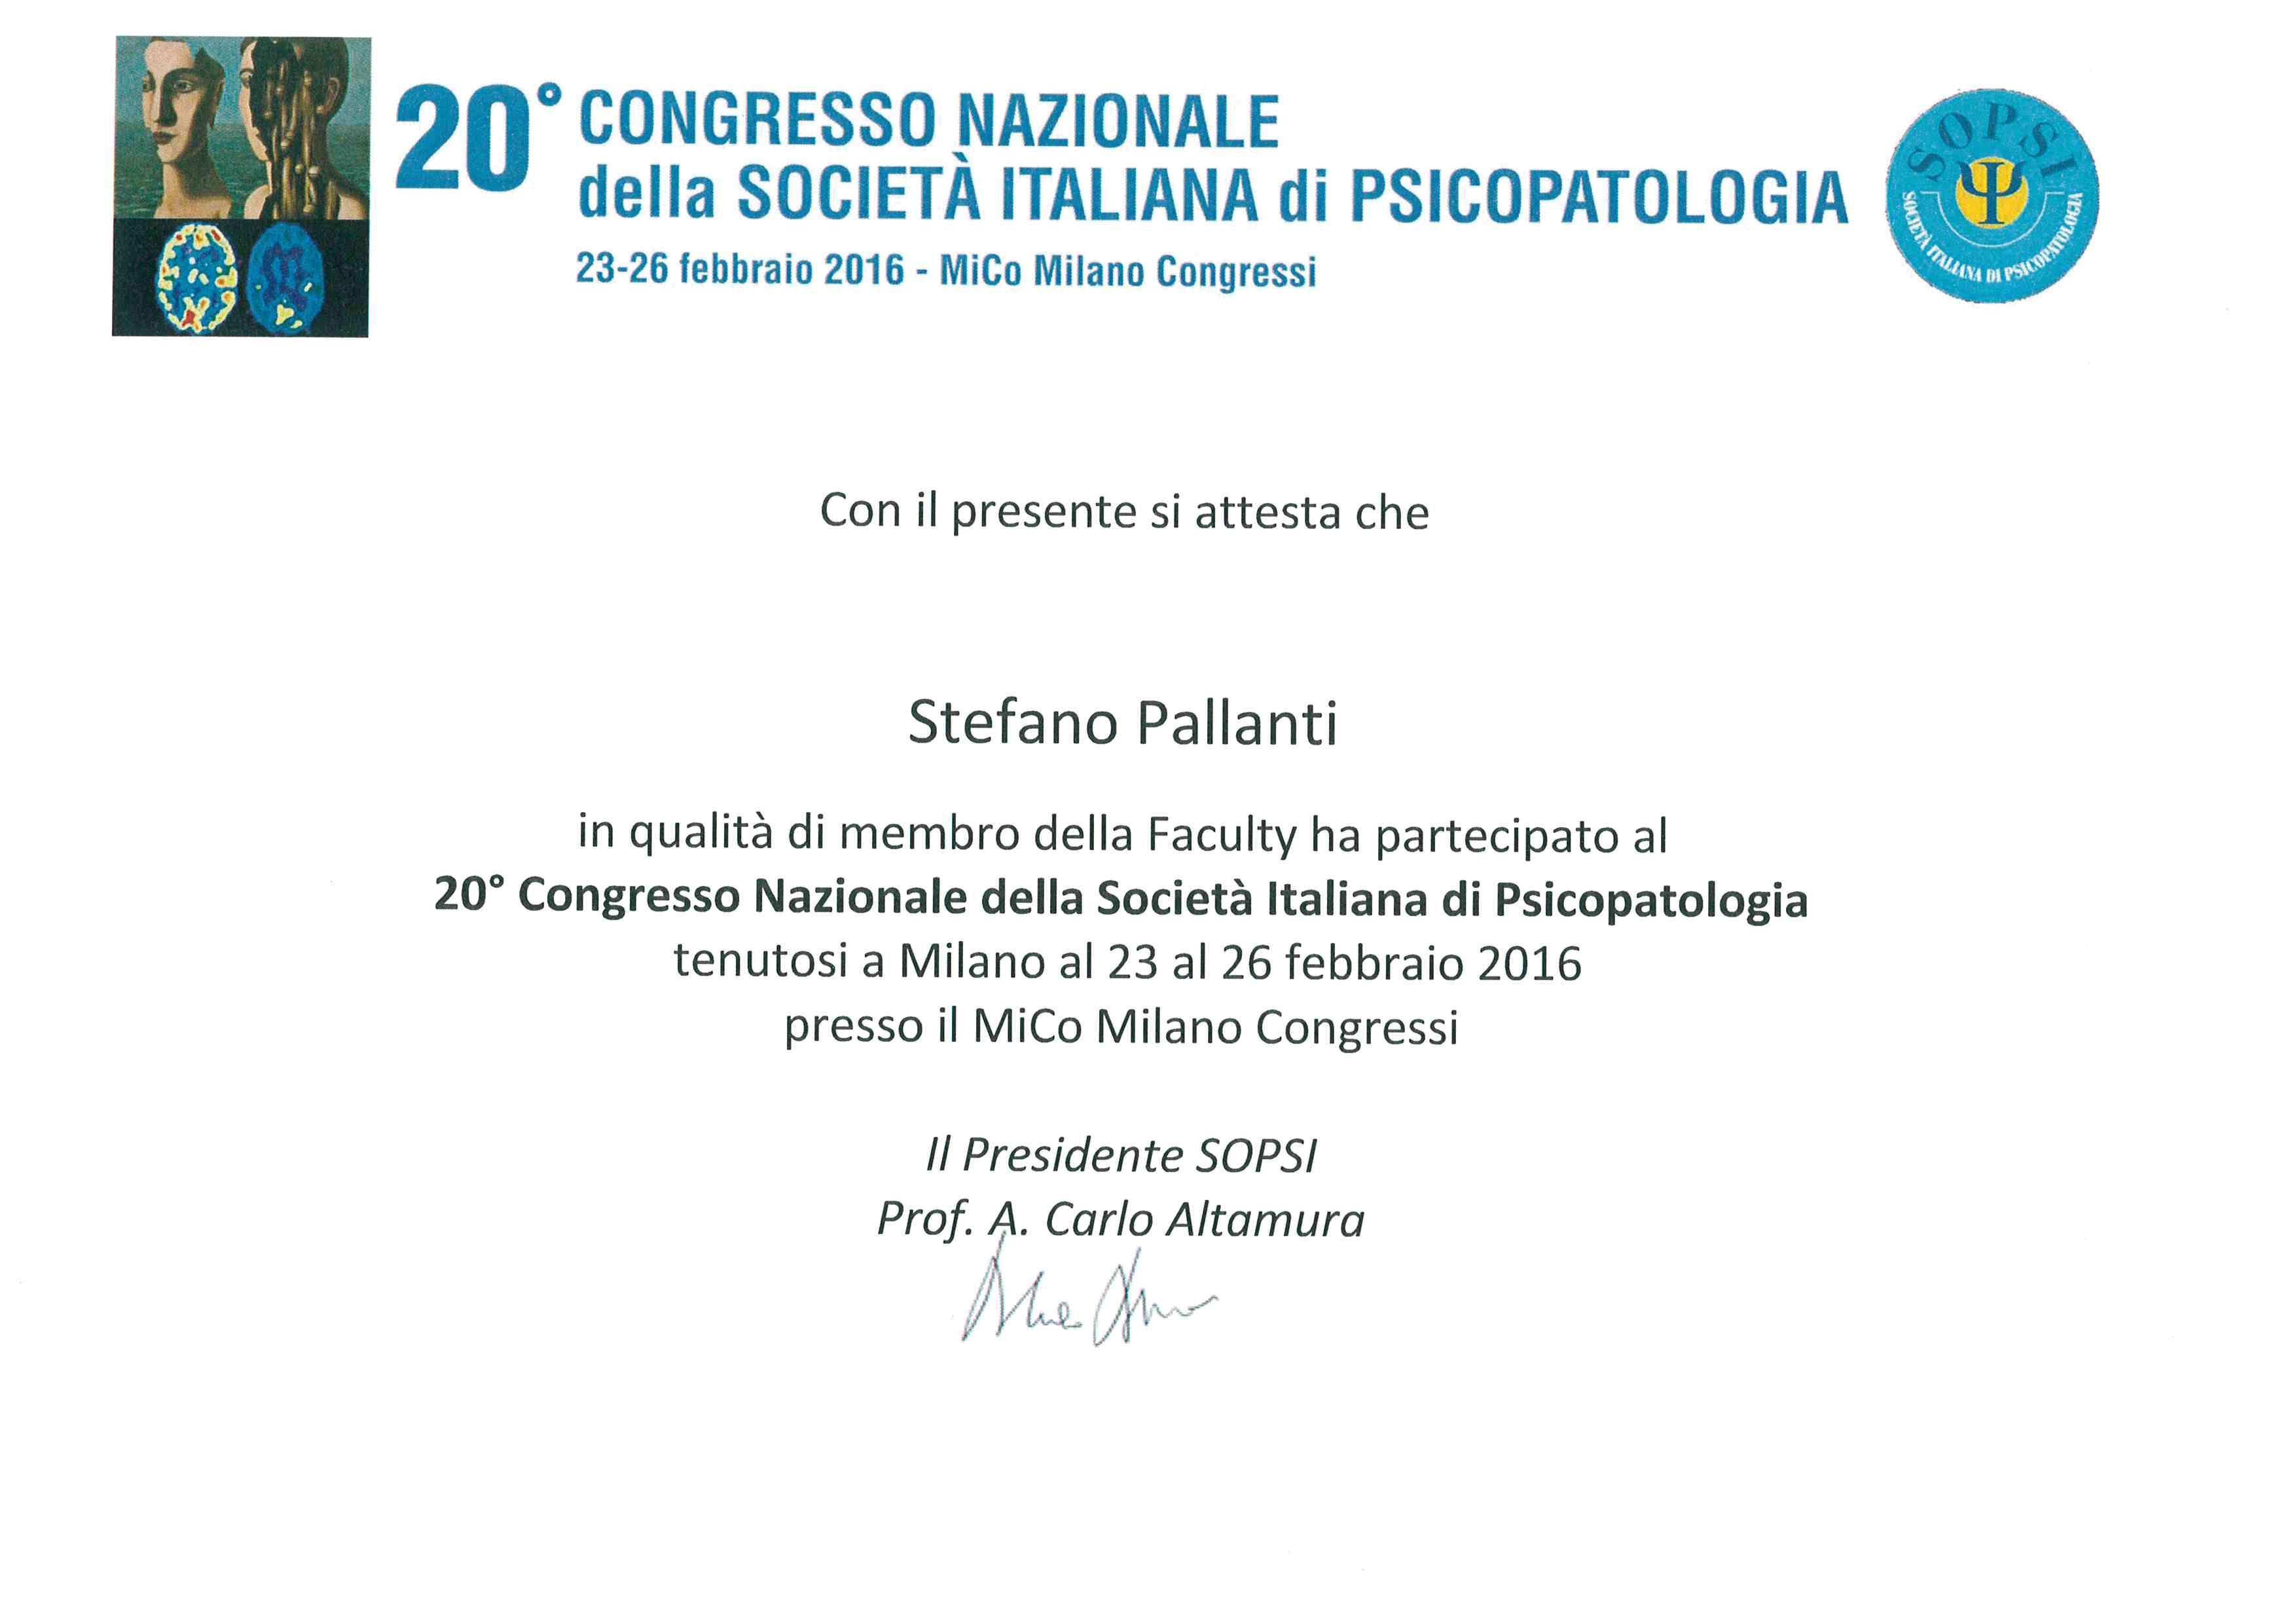 fe9fb0d6a9 Prof. Stefano Pallanti Precision Psychiatry and Cutting-edge therapy